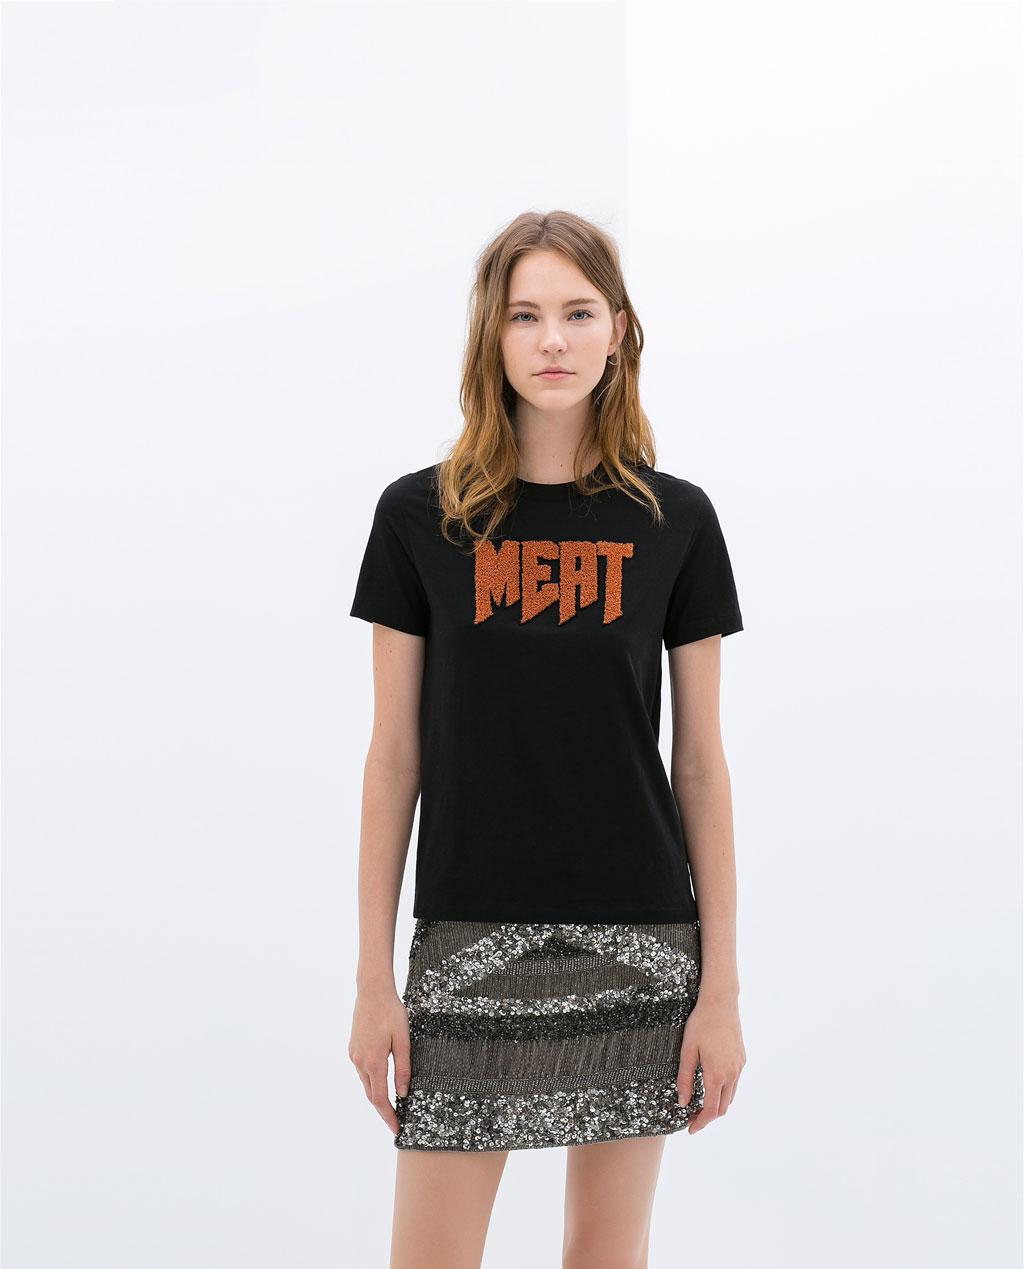 Zara summer spring t shirts collection for women for Zara black t shirt dress